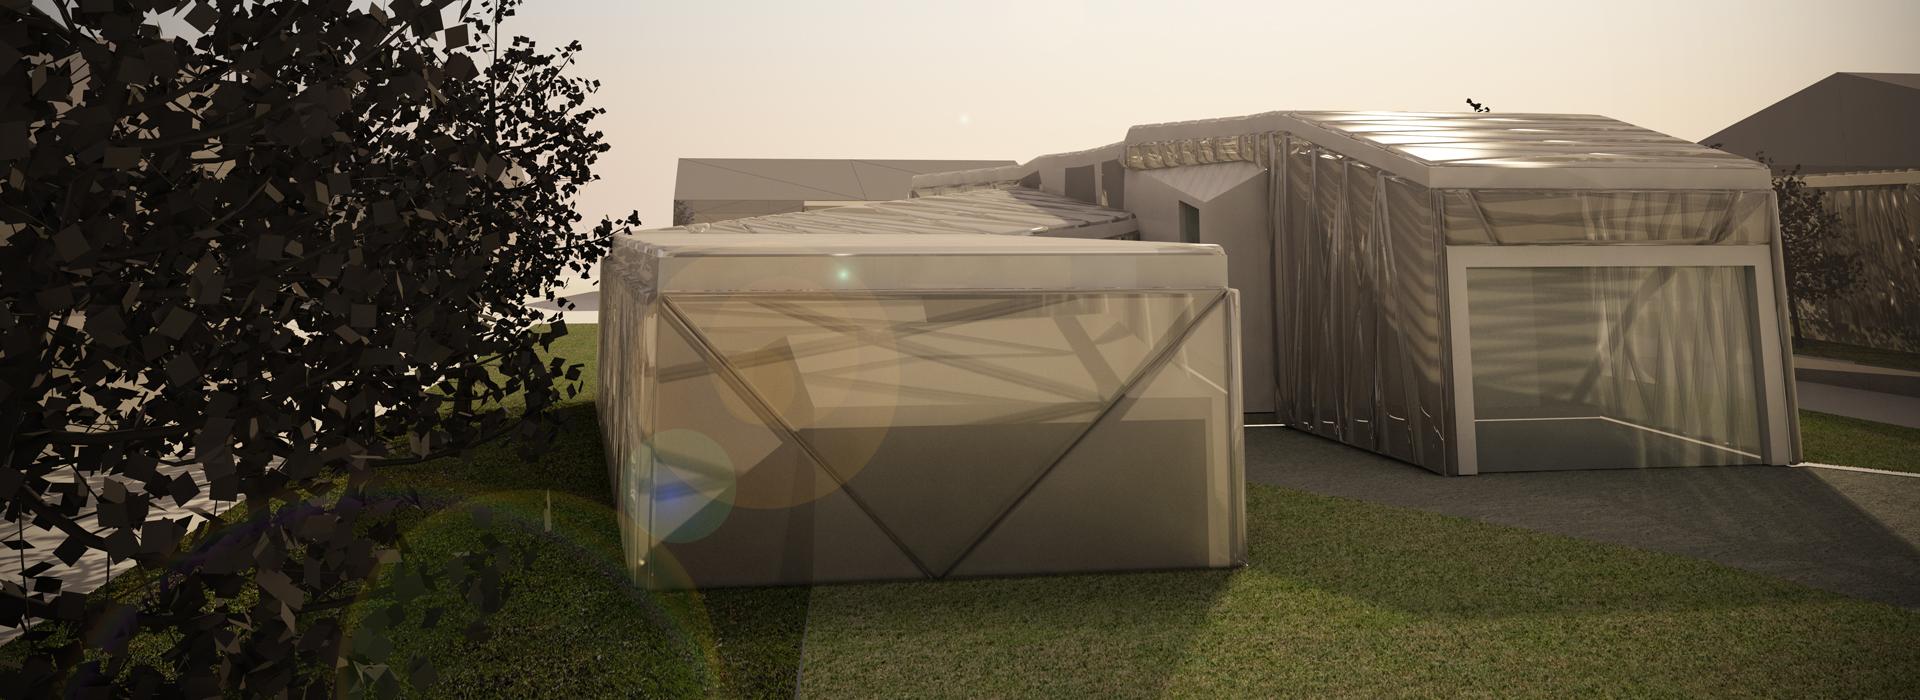 Experimental house 1